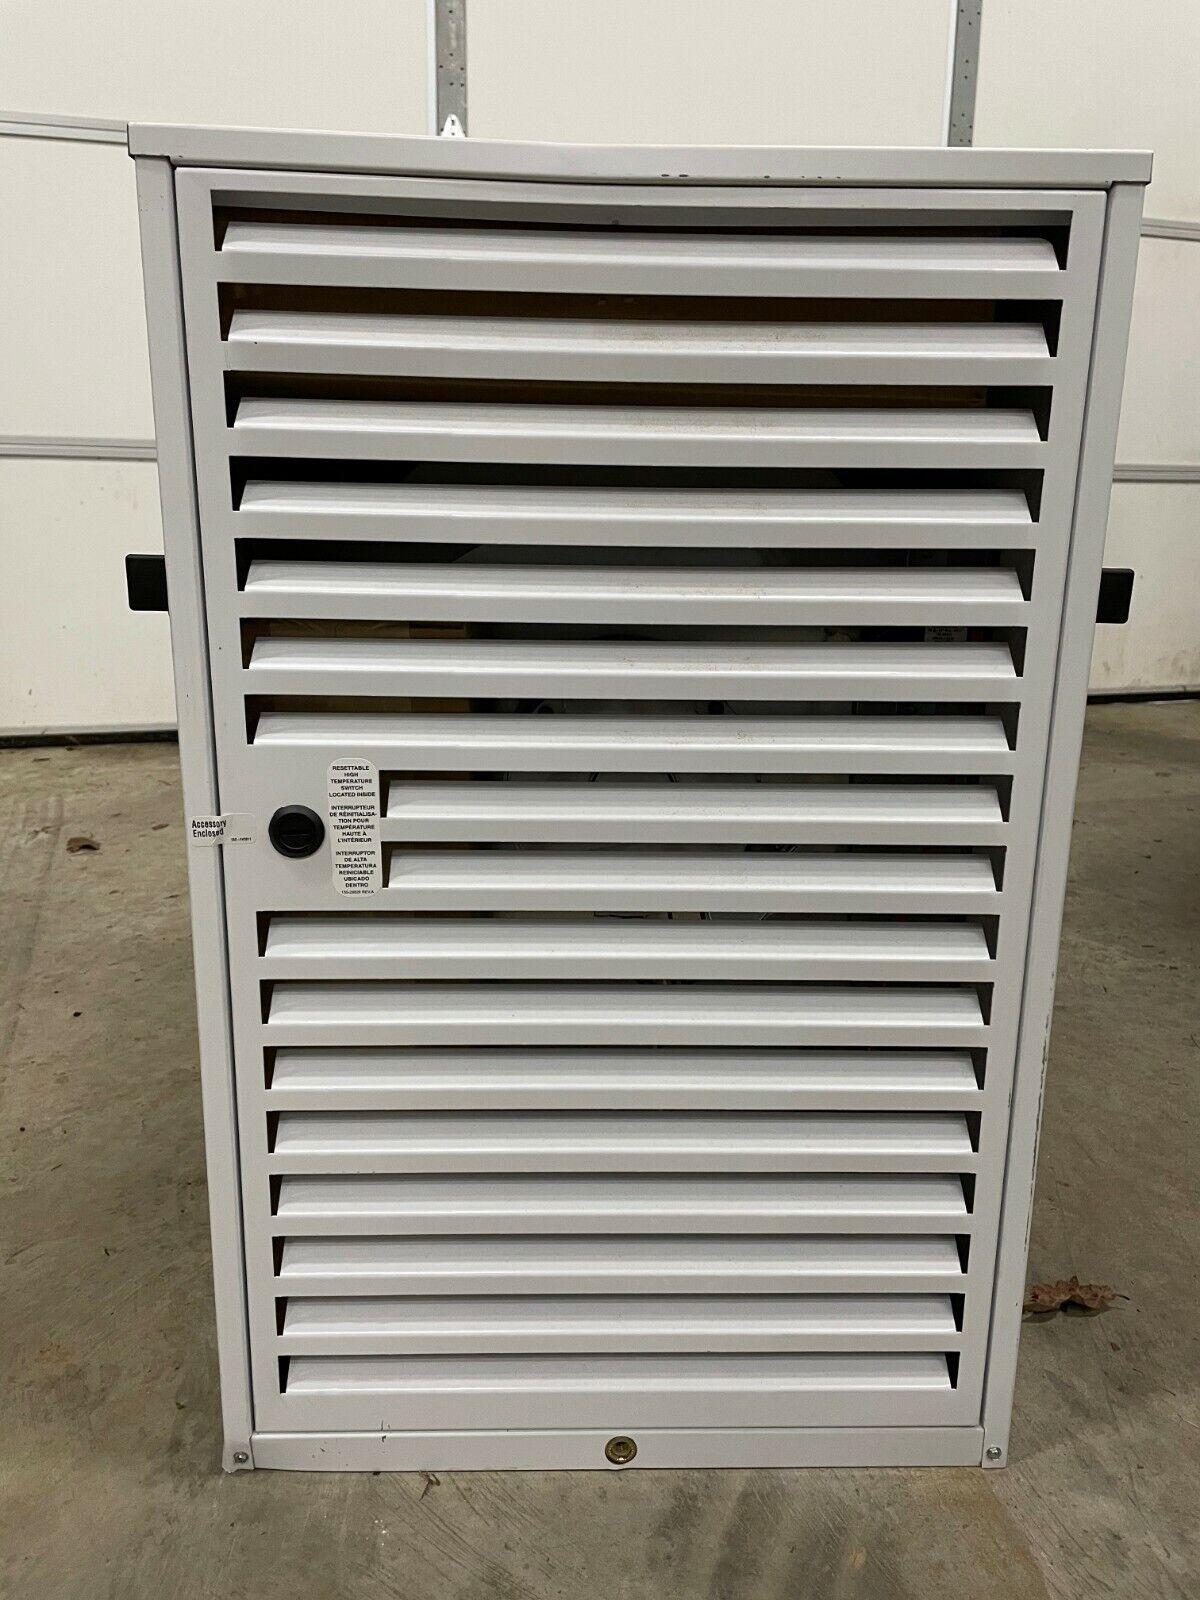 SUPCO DH500 5000 Watt Heat Recoil Kit for sale online